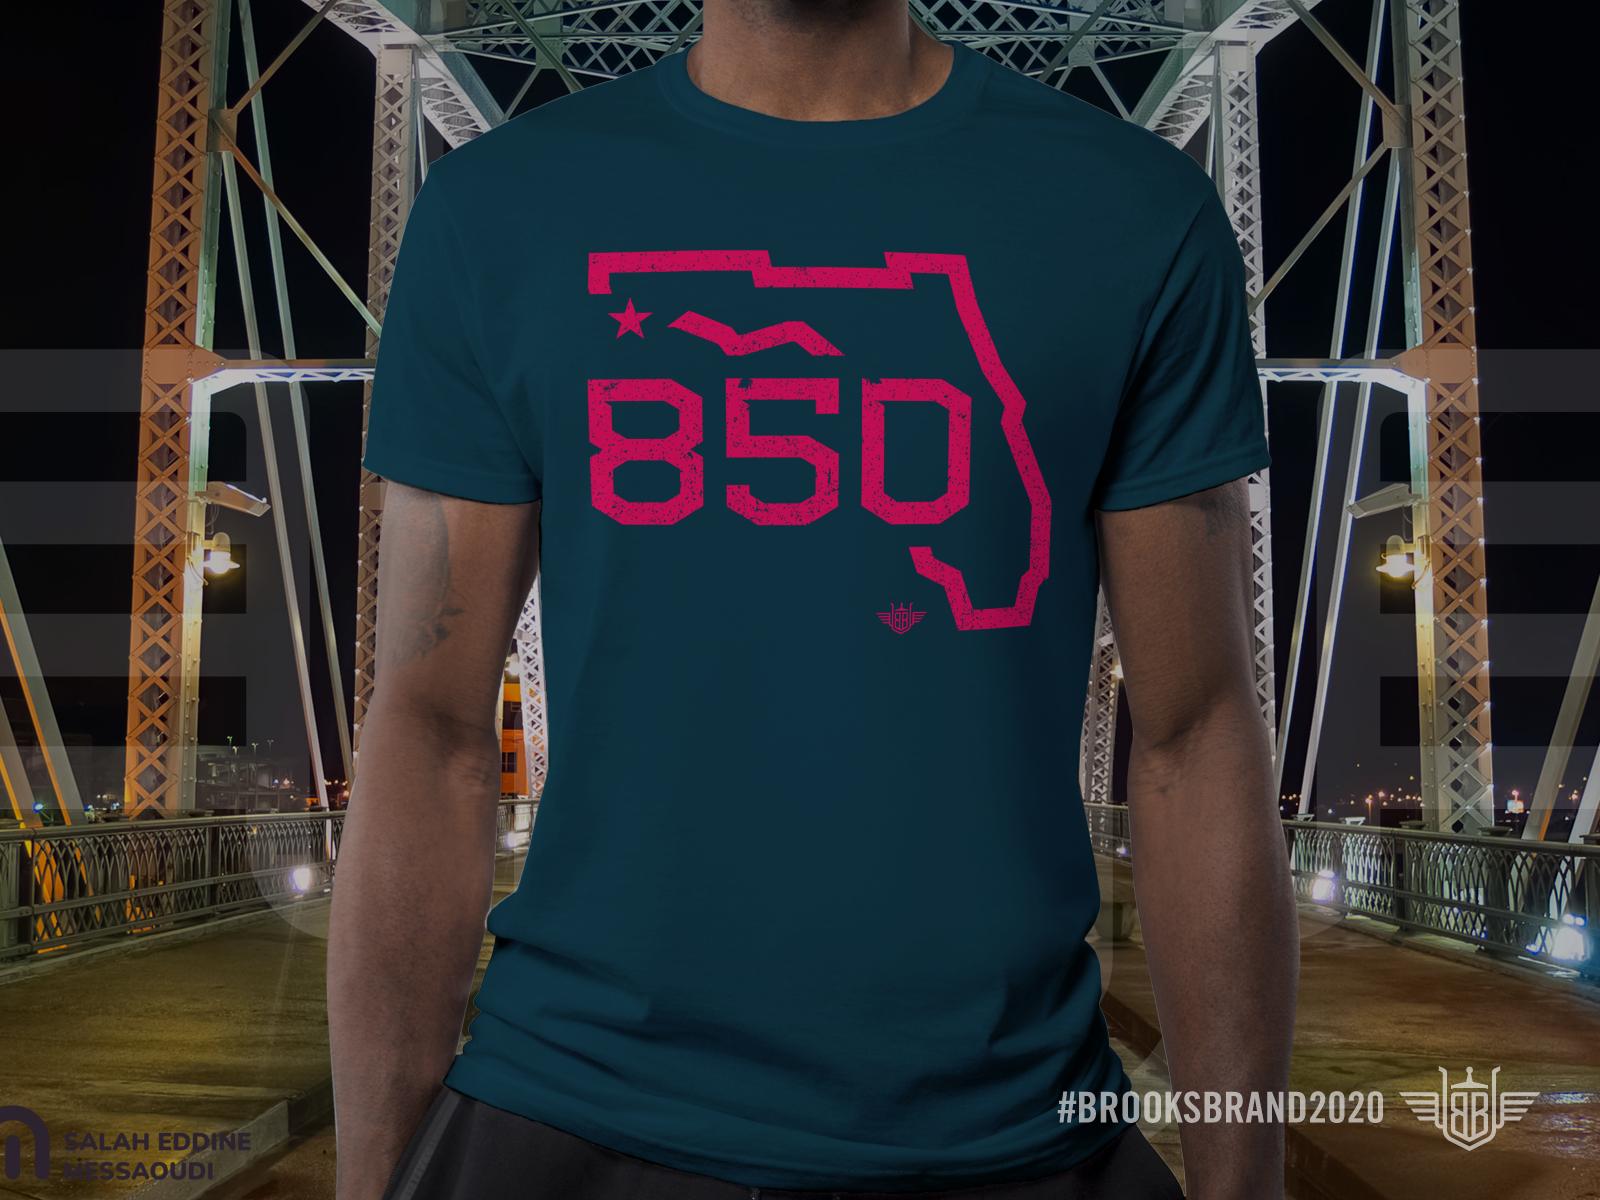 850 t shirt mockup